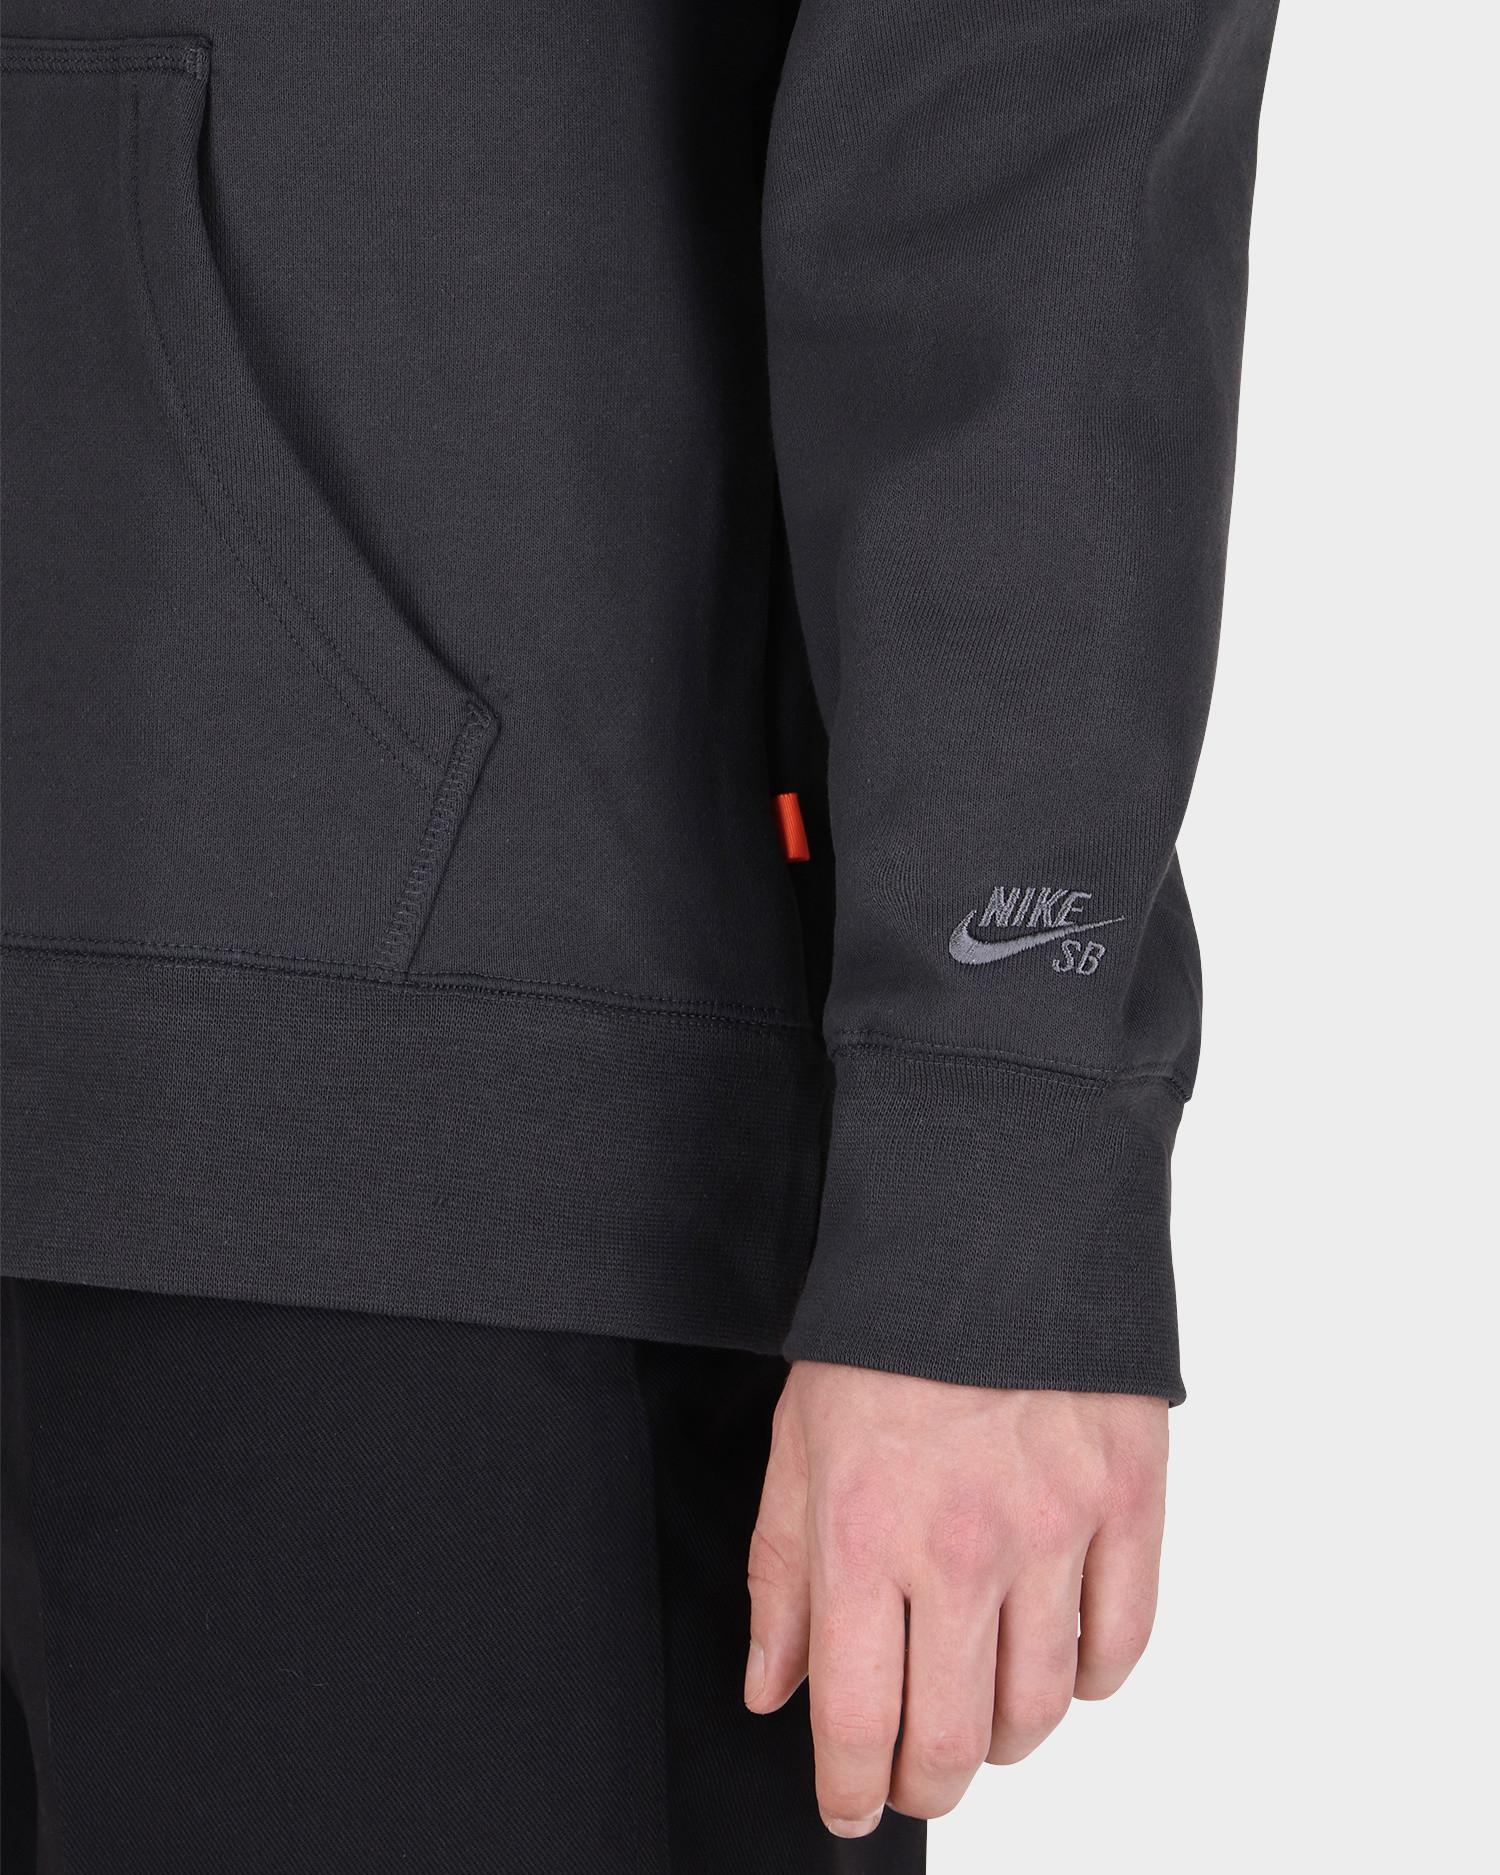 Nike Sb Orange Label Hoodie Dark Smoke Grey/Smoke Grey